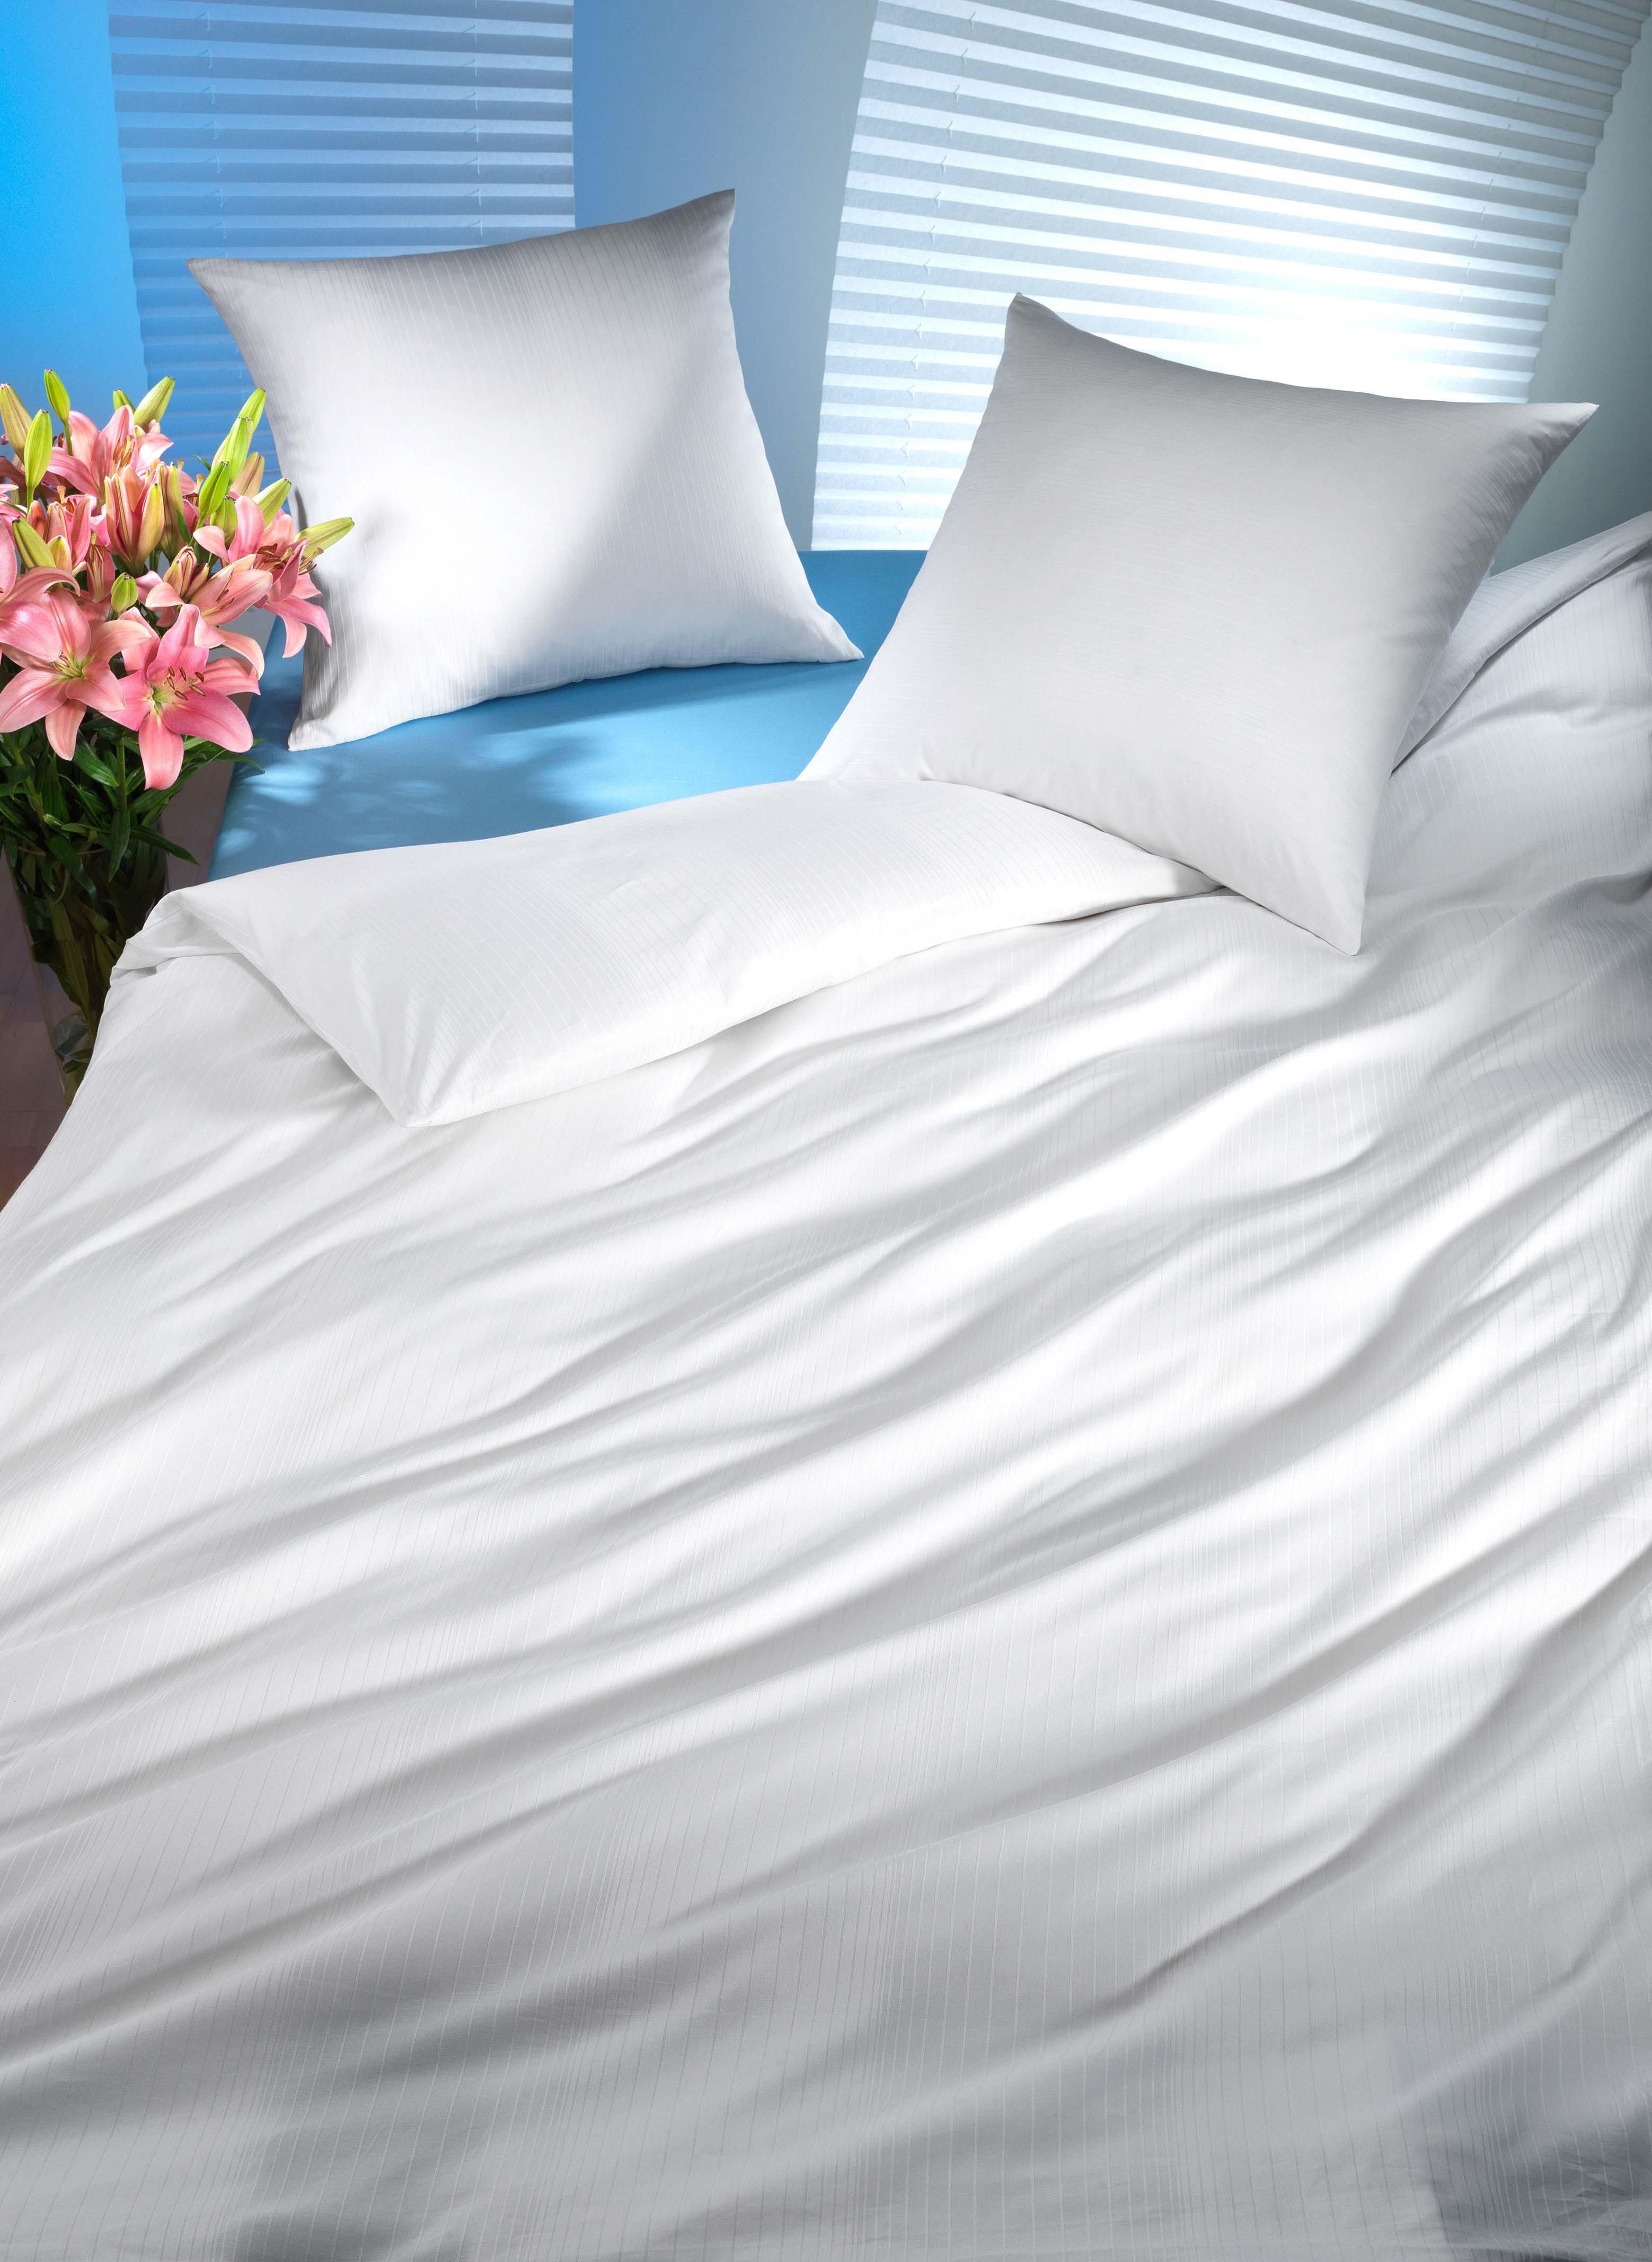 S-Duvet rayures 135x170 blanc